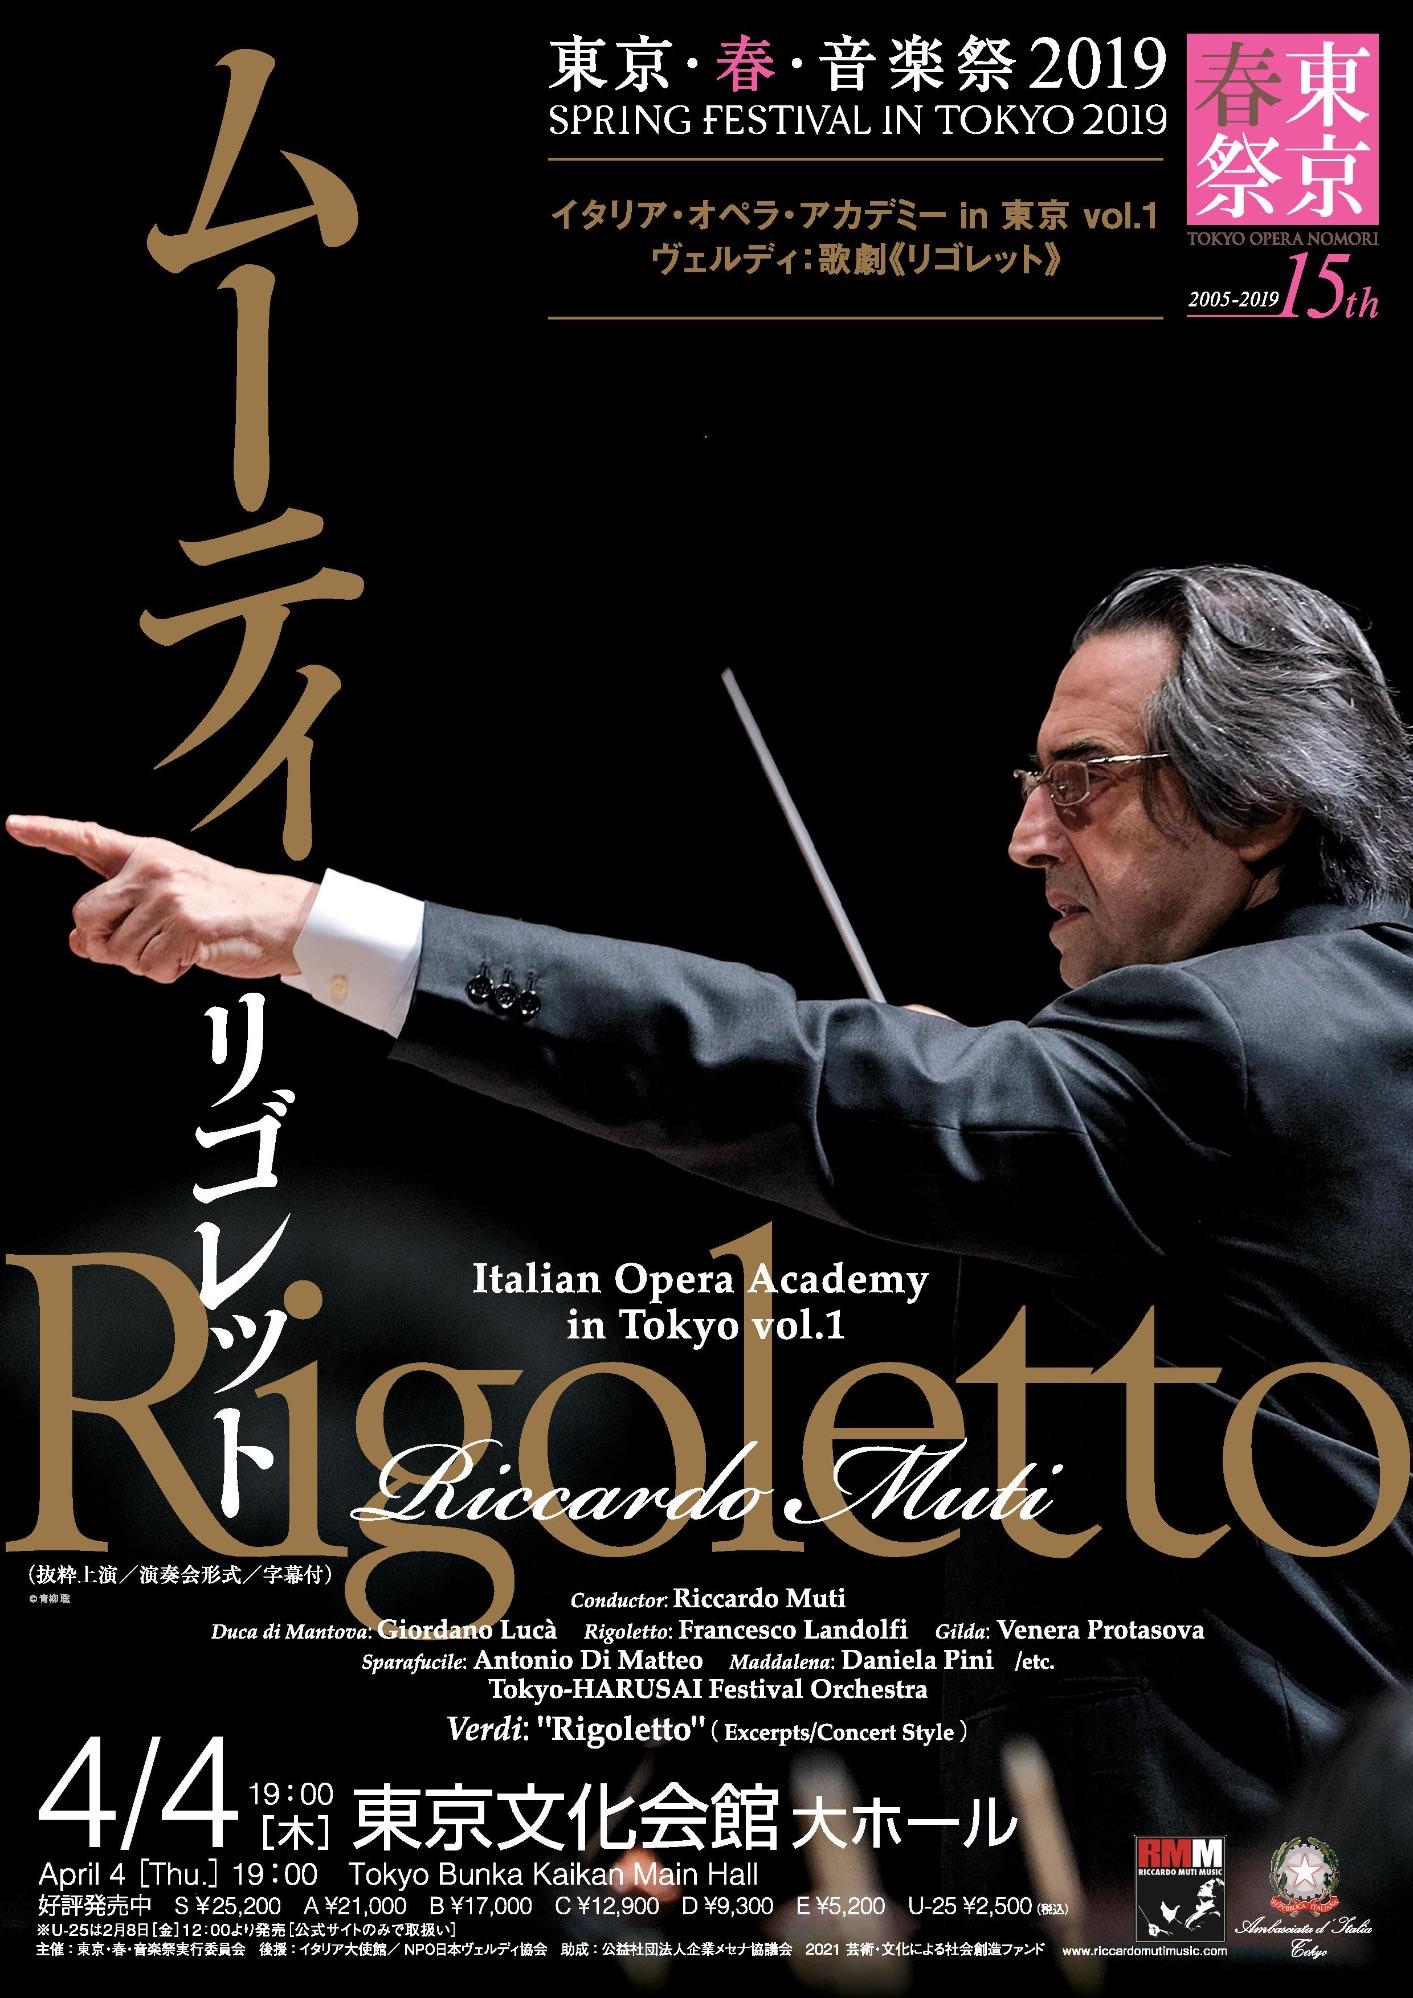 RIGOLETTO - G. Verdi